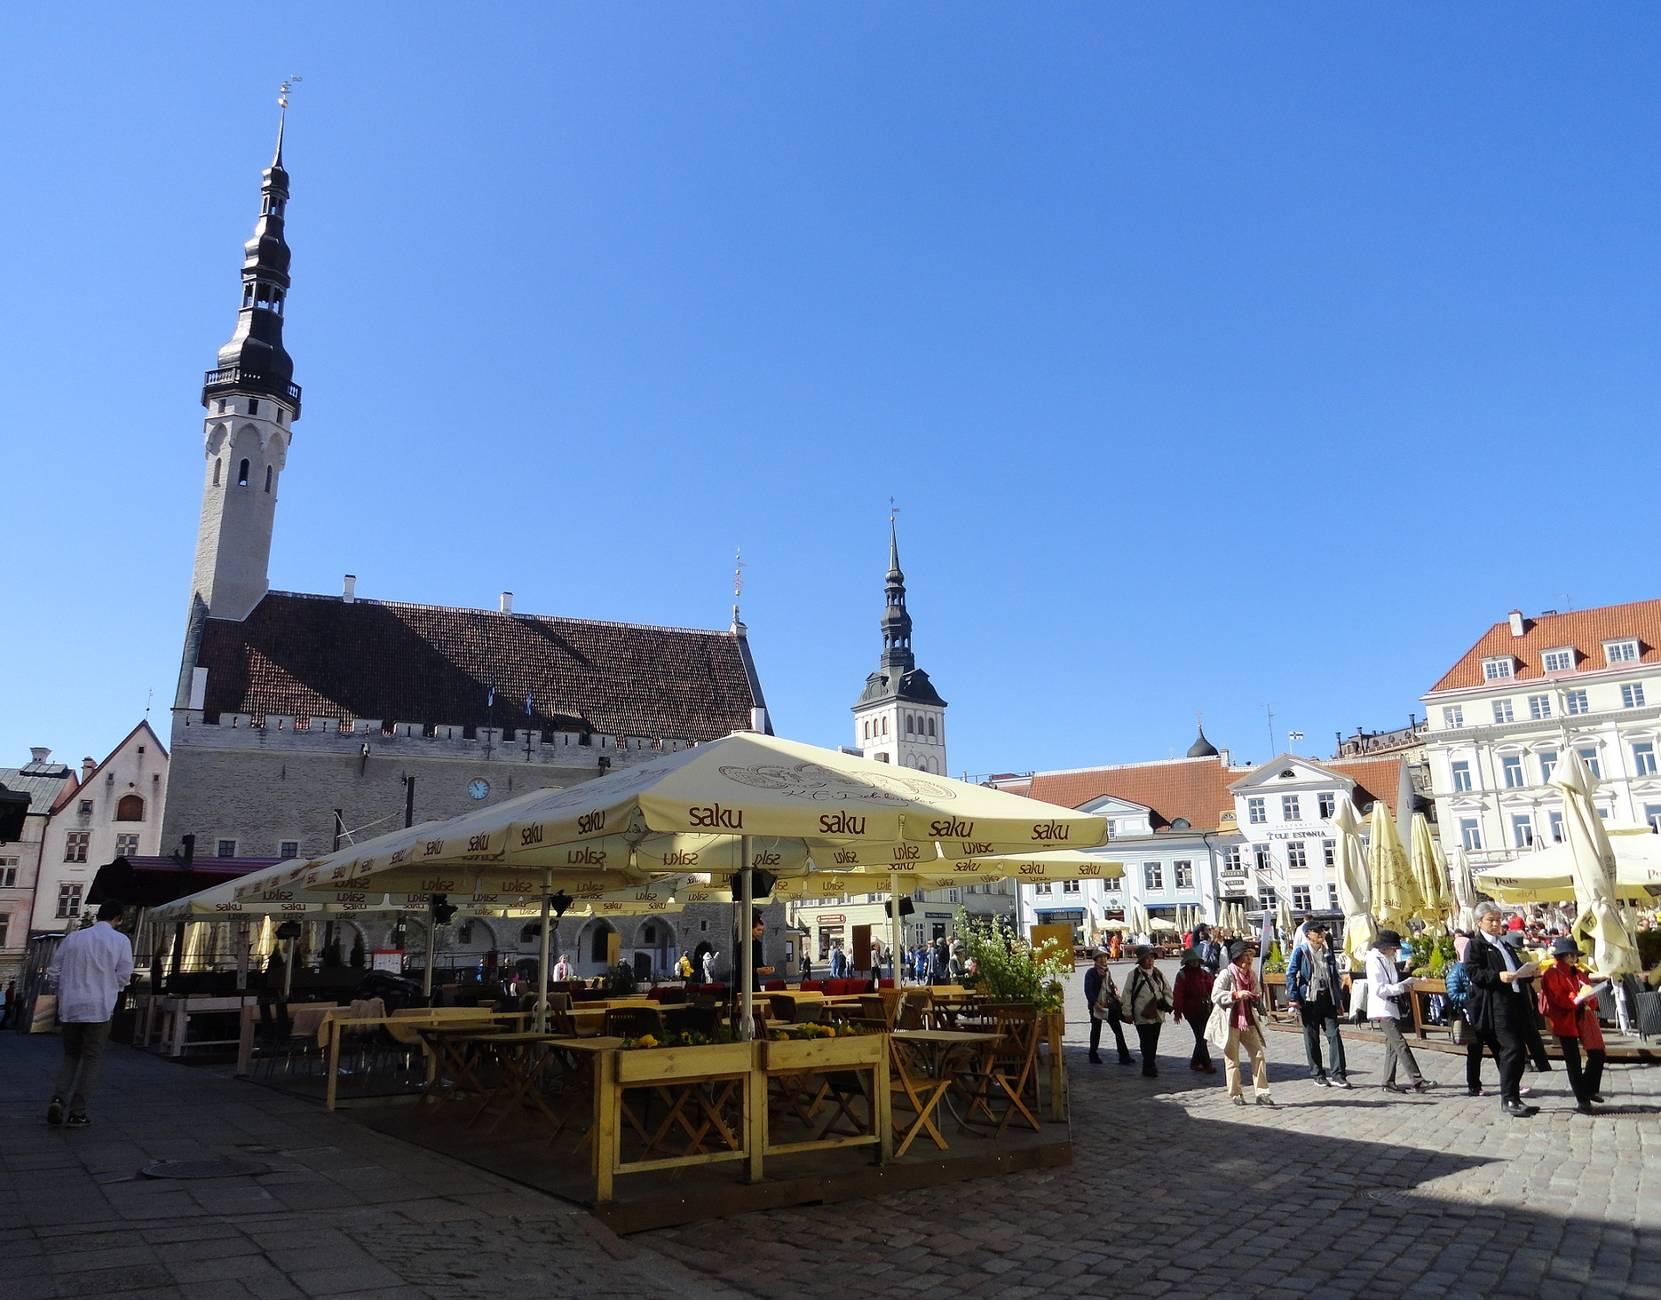 Town Hall Square in Tallinn, Estonia